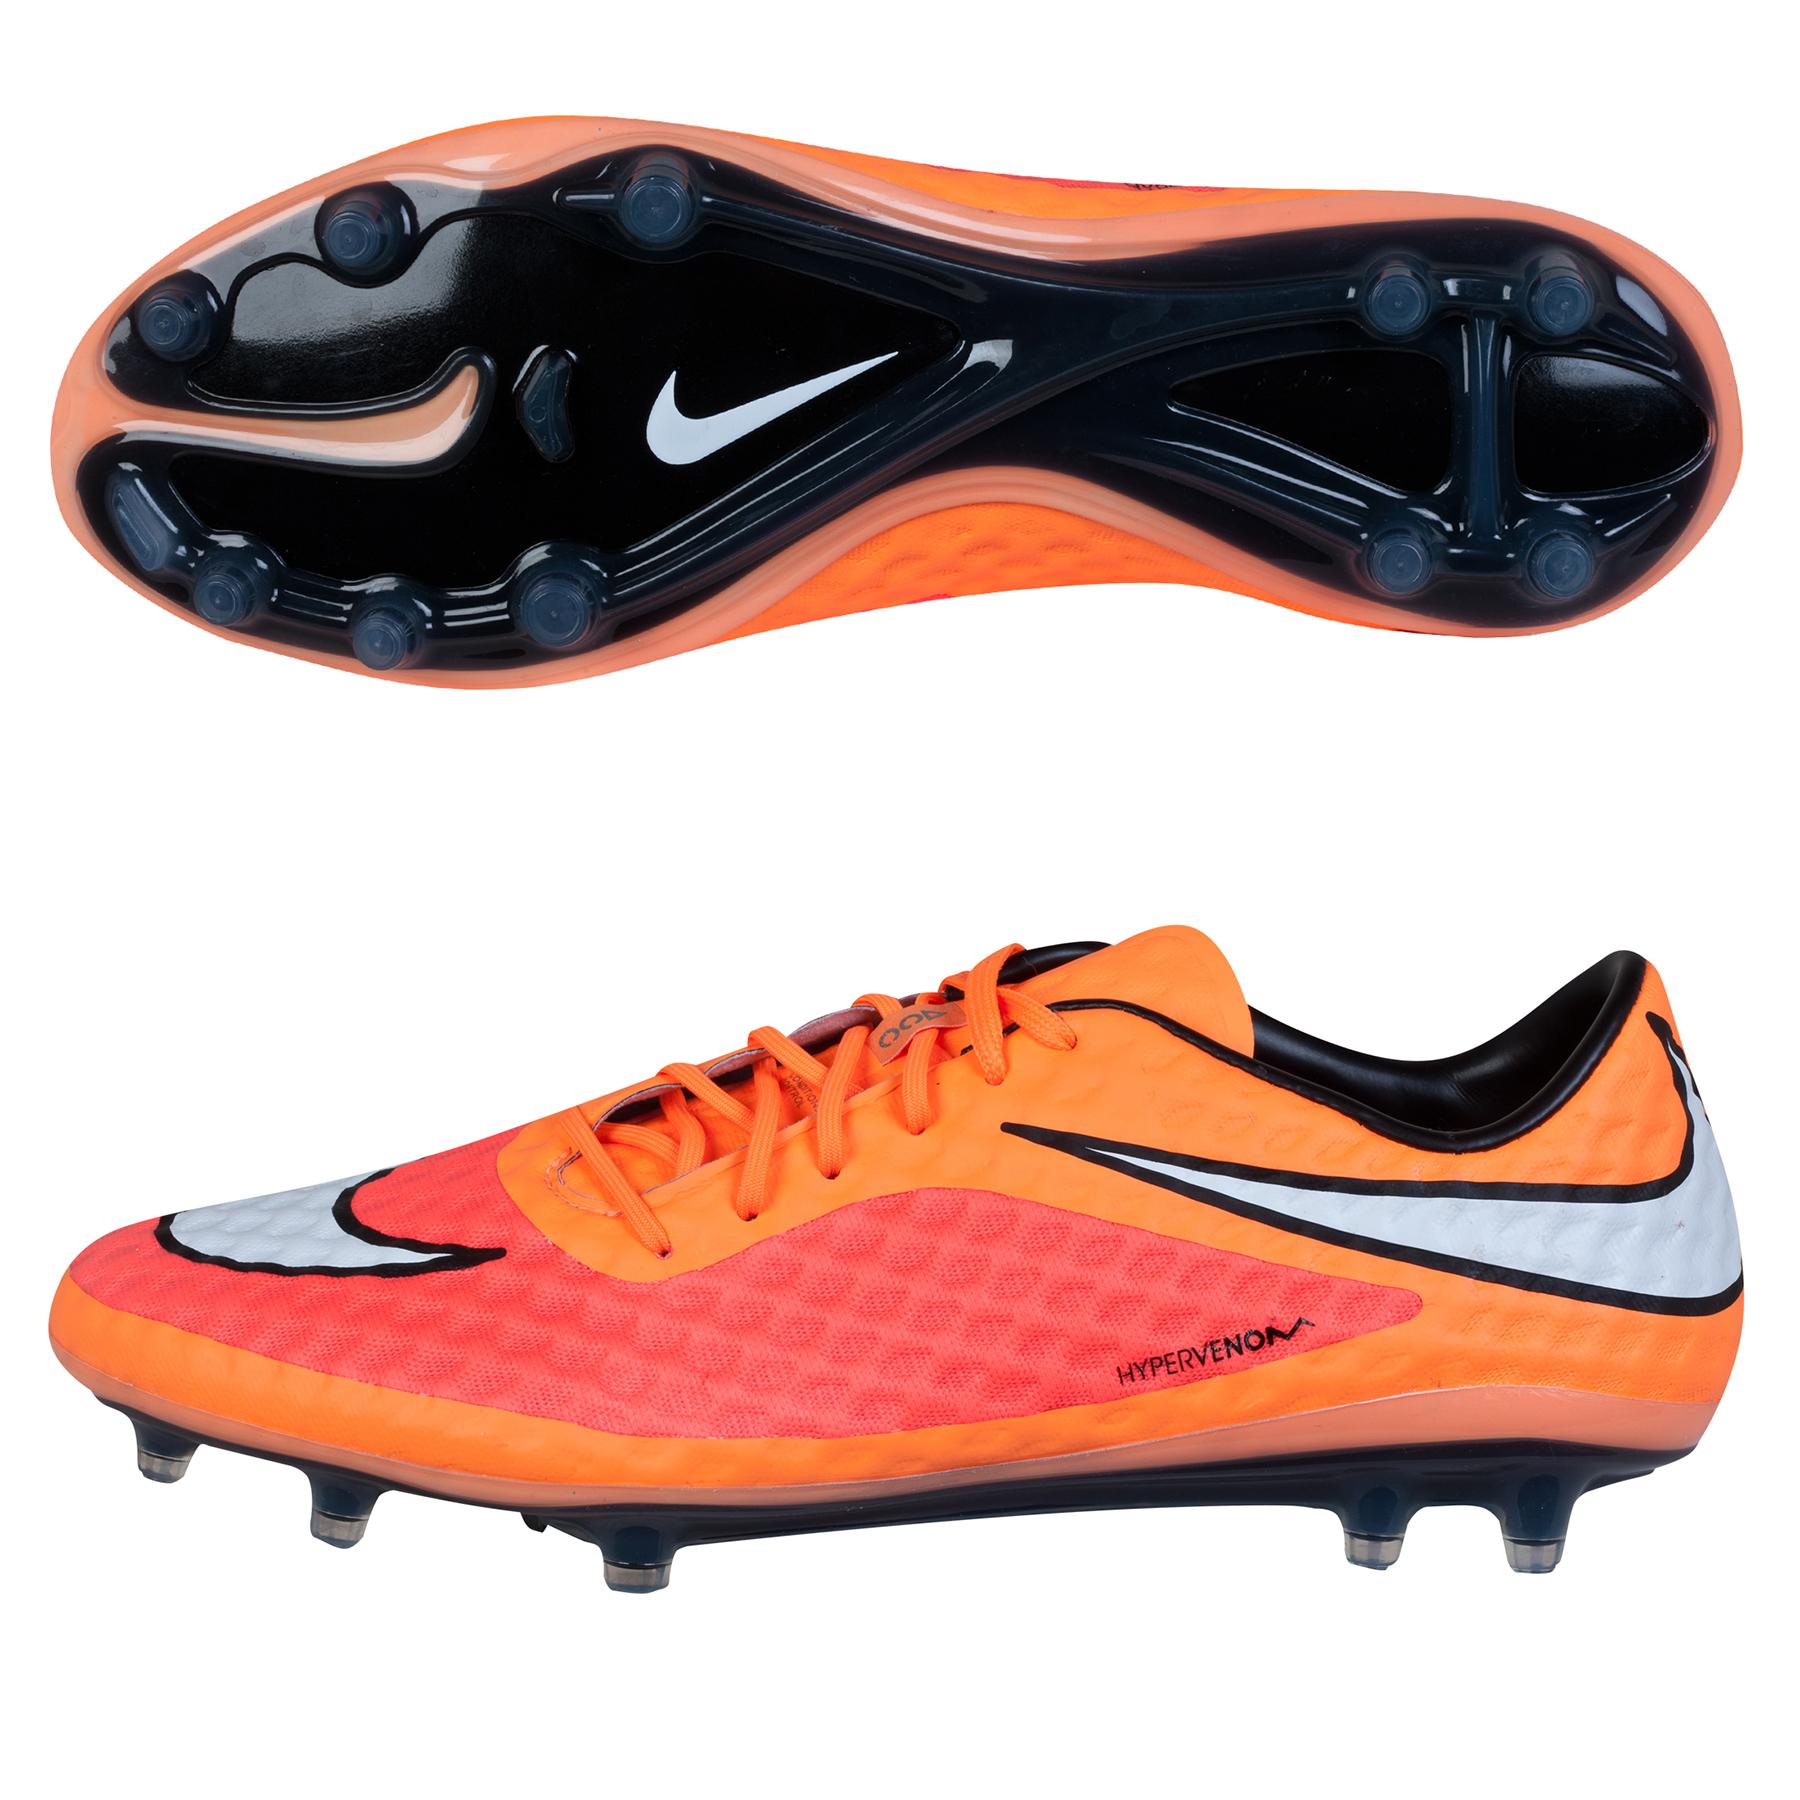 Nike Hypervenom Phantom Firm Ground Football Boots Orange